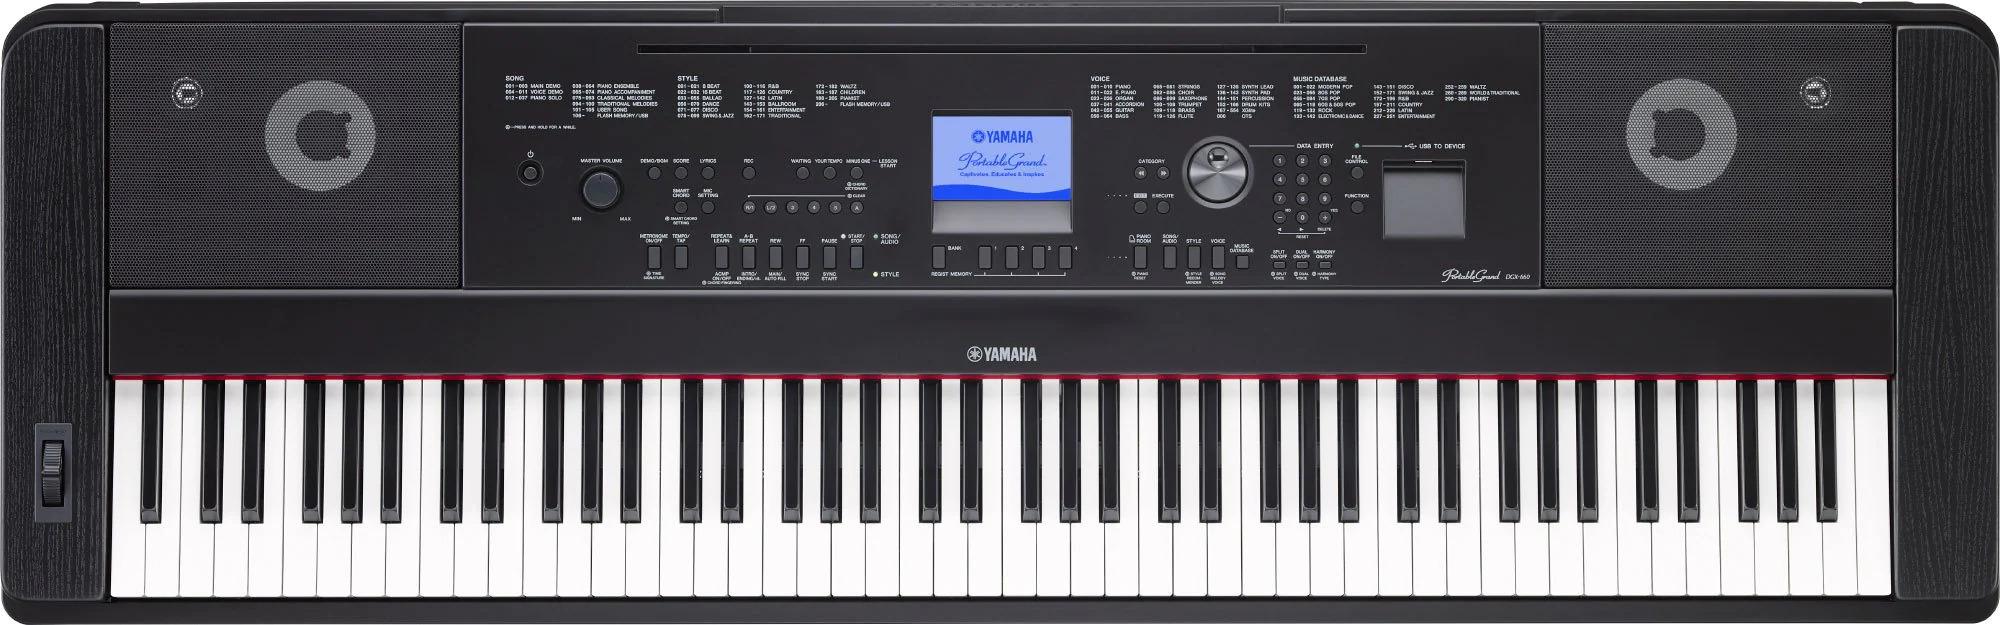 Design of Yamaha DGX-660